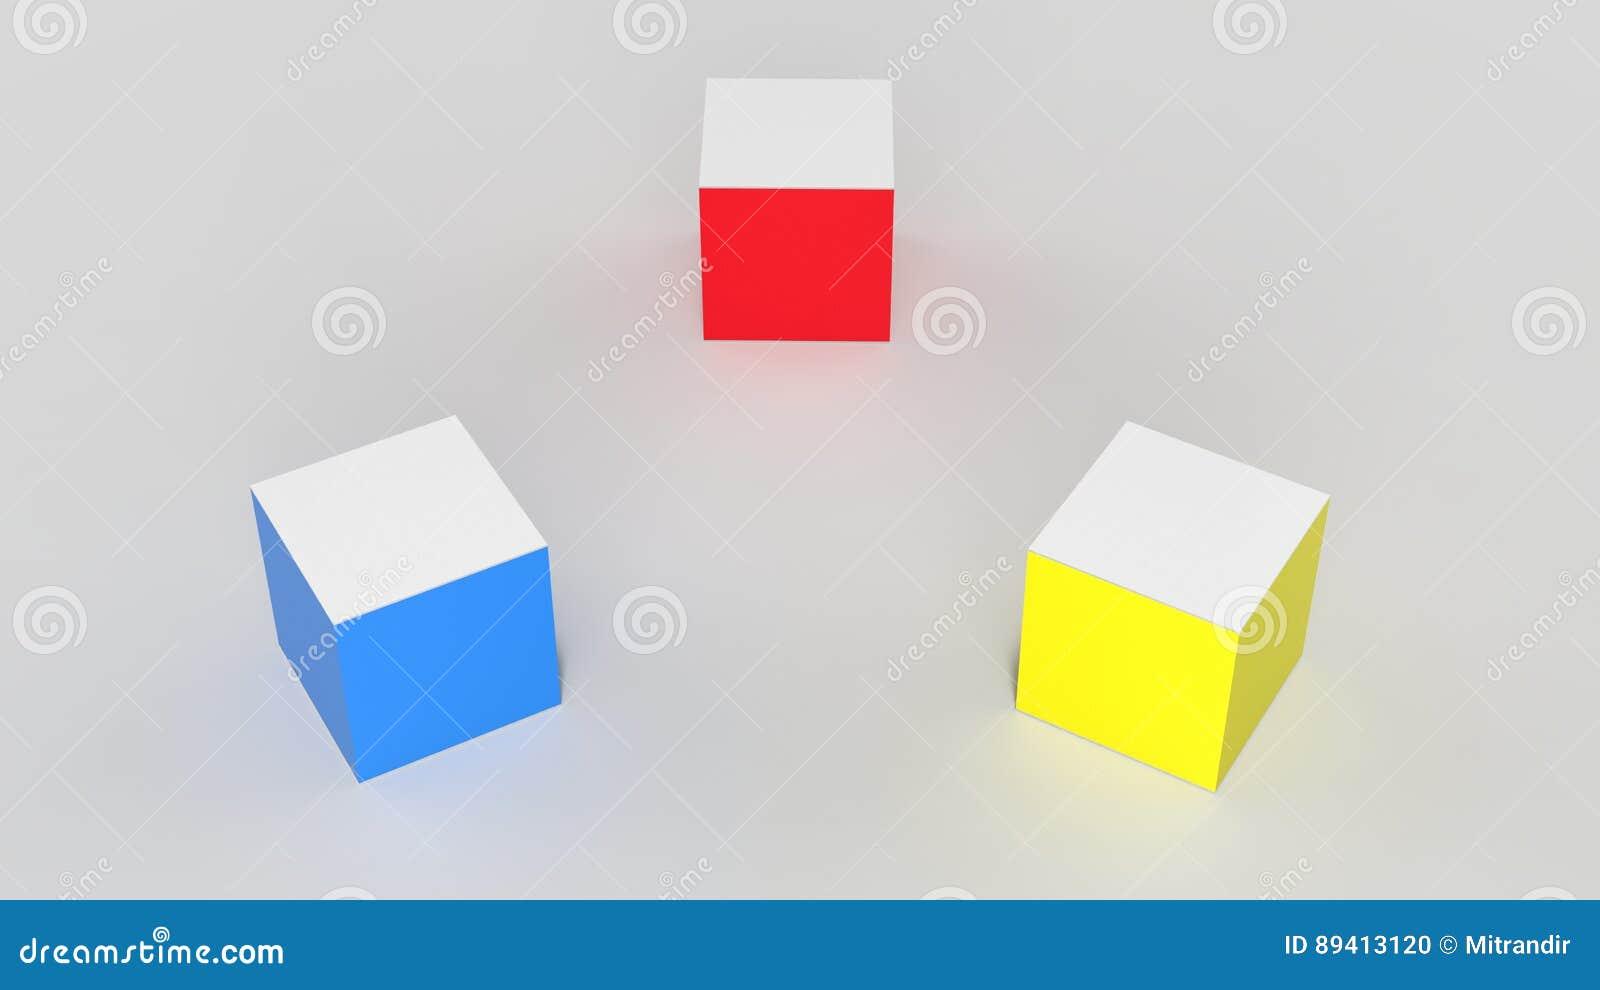 Cubos de Luminecent em cores preliminares